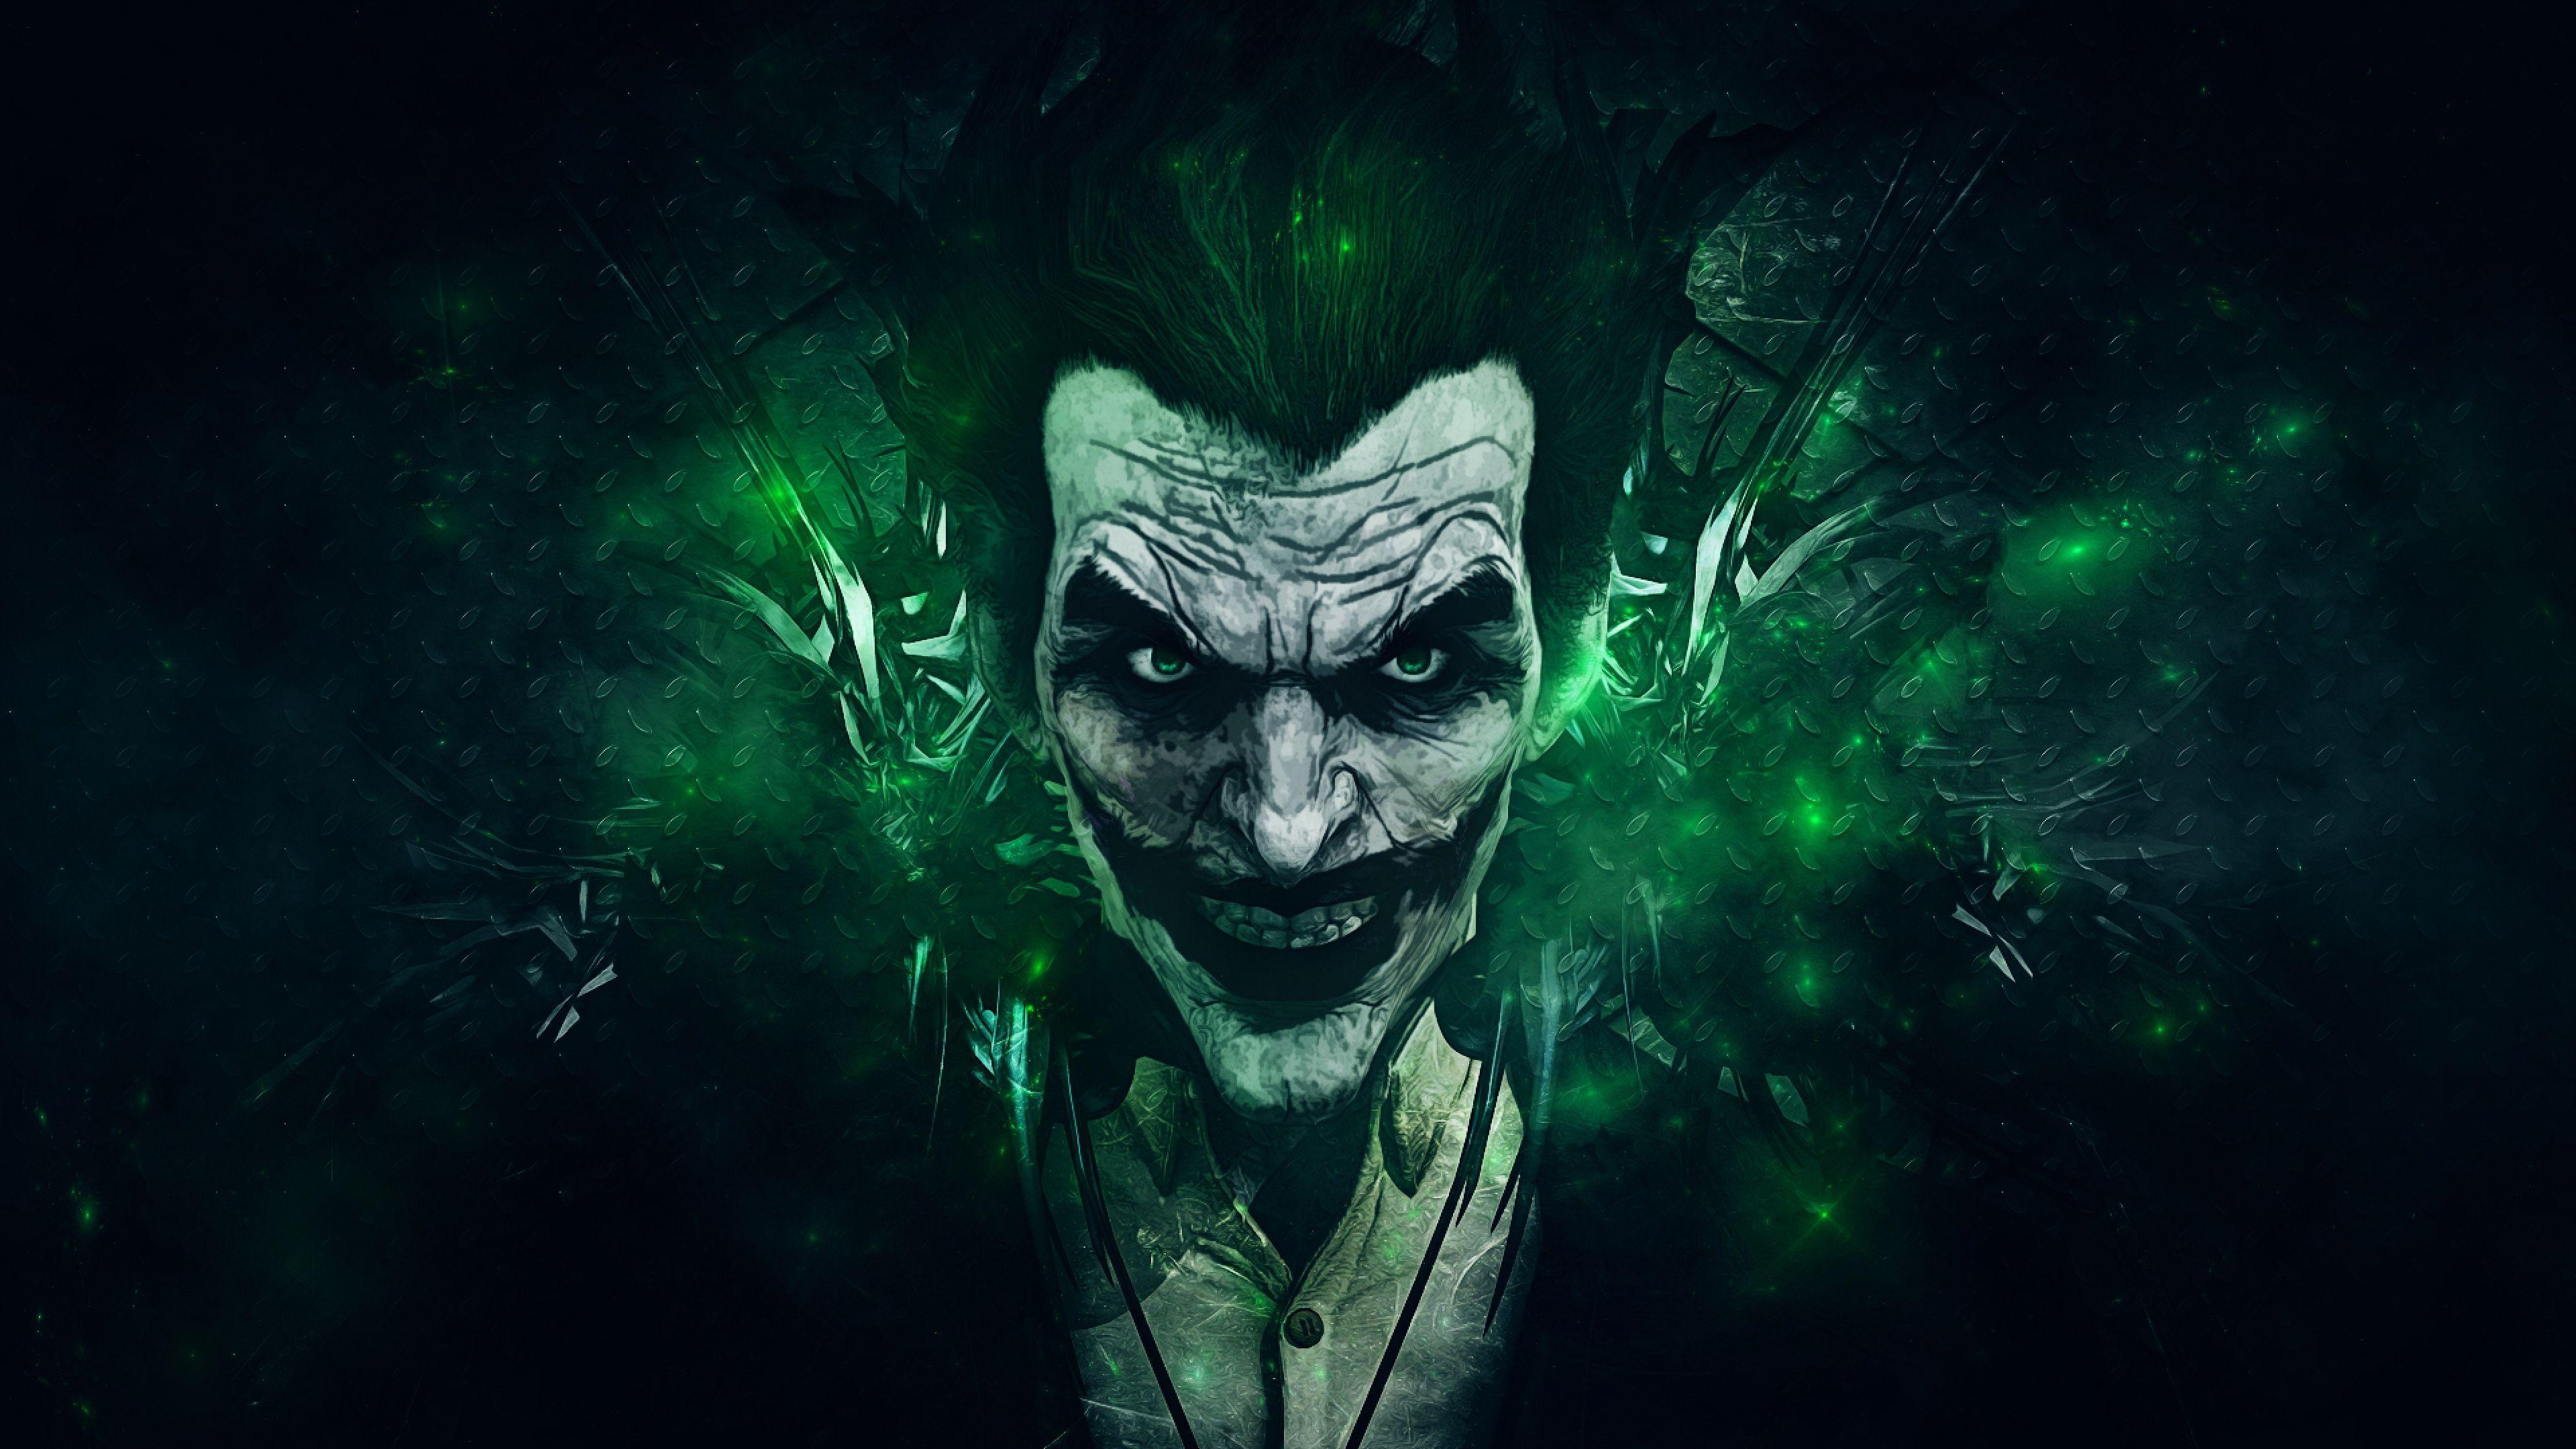 New Joker Wallpapers Top Free New Joker Backgrounds